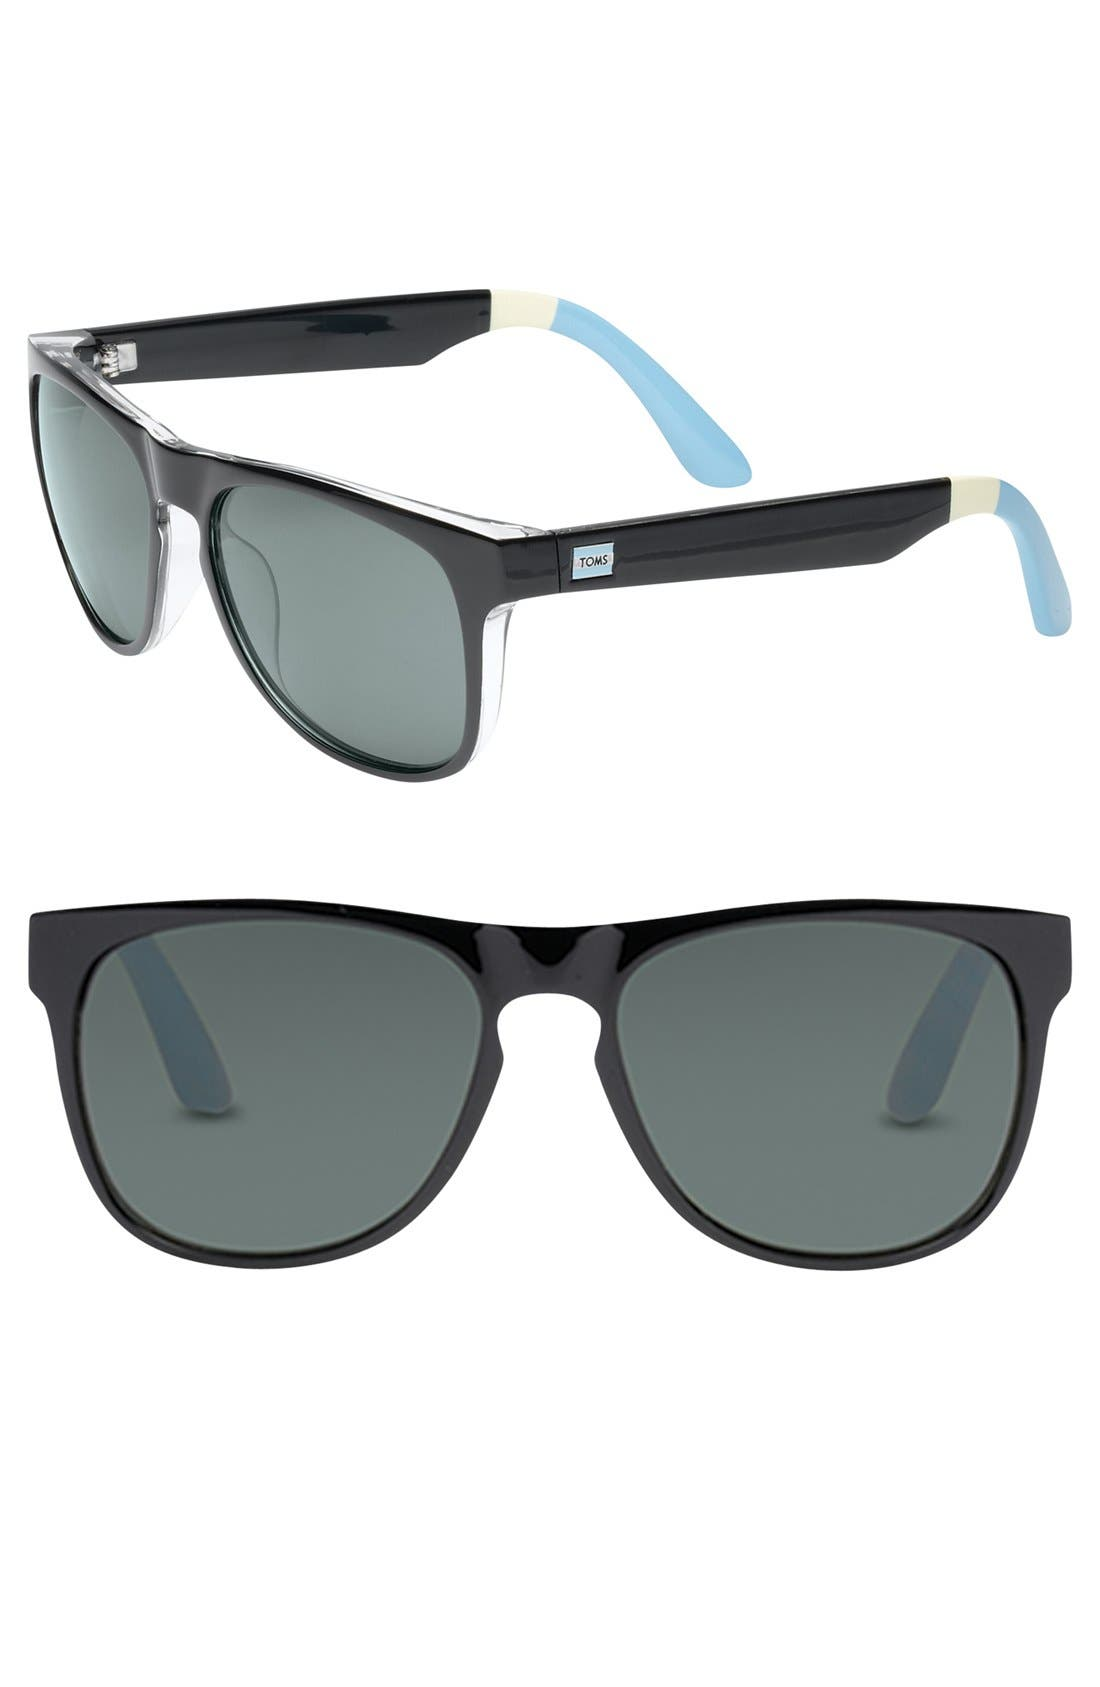 Main Image - TOMS 'Phoenix' 57mm Sunglasses